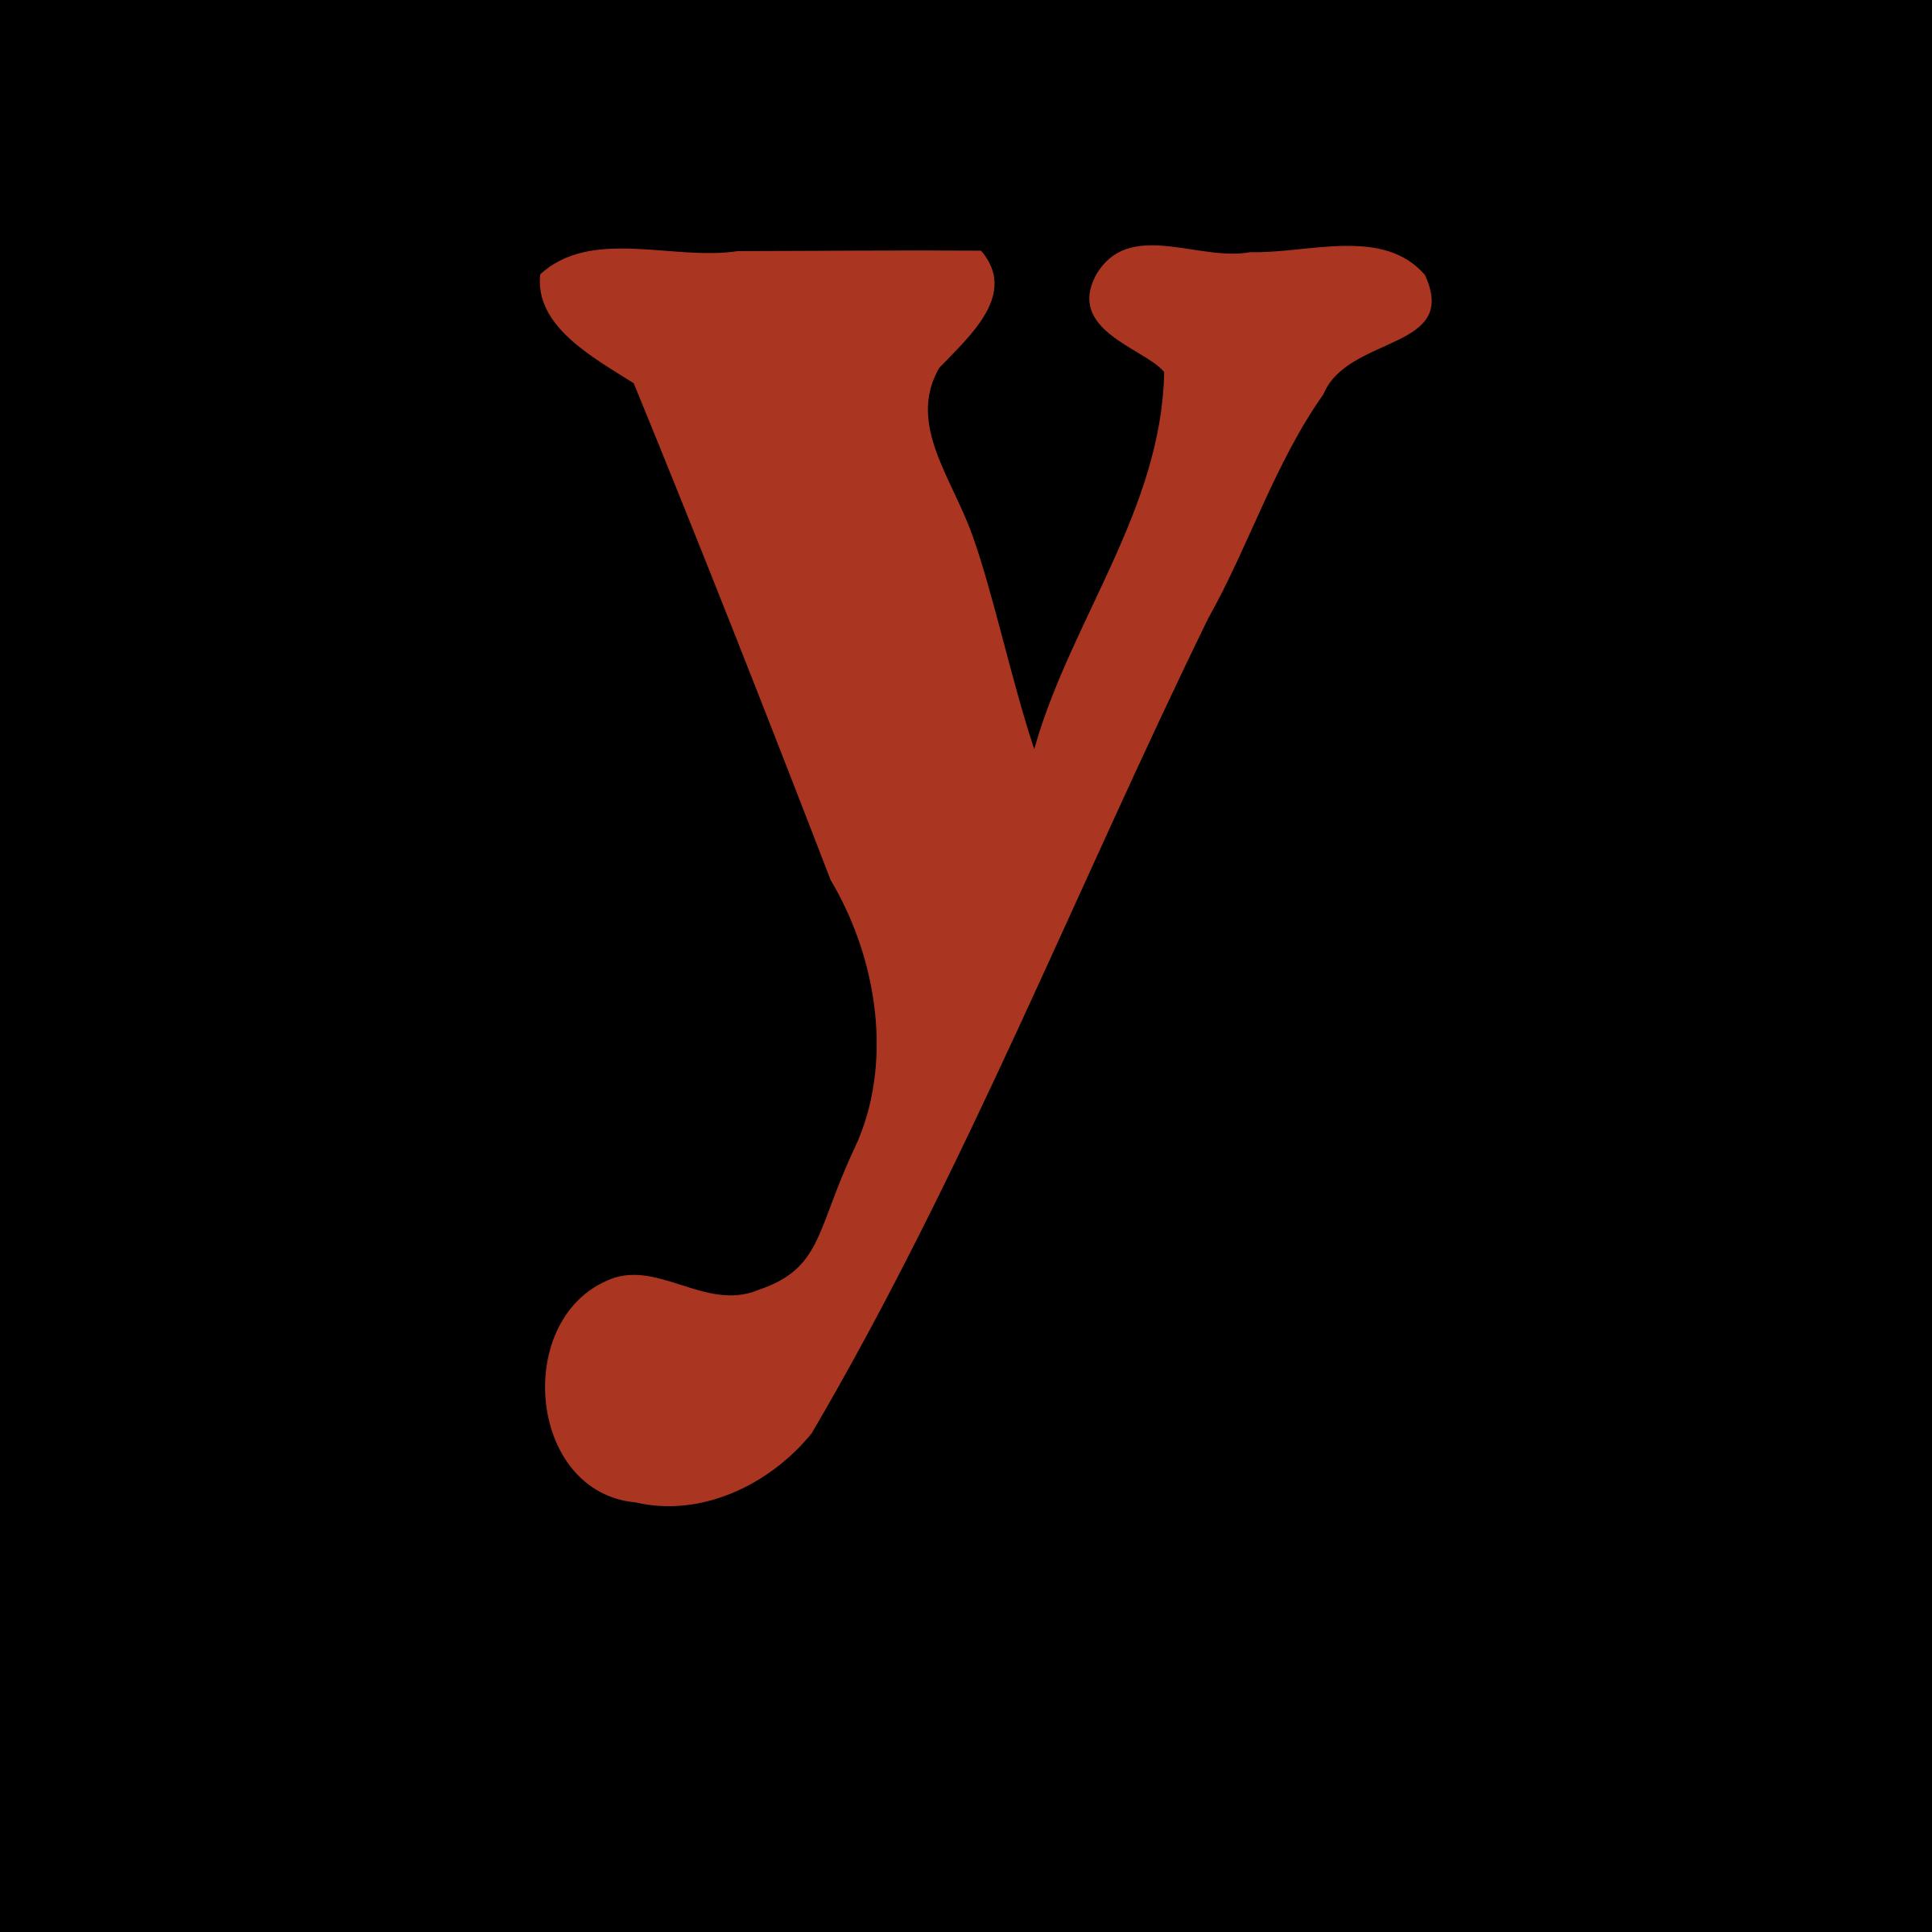 clipart lowercase y yc partners llc y clipart